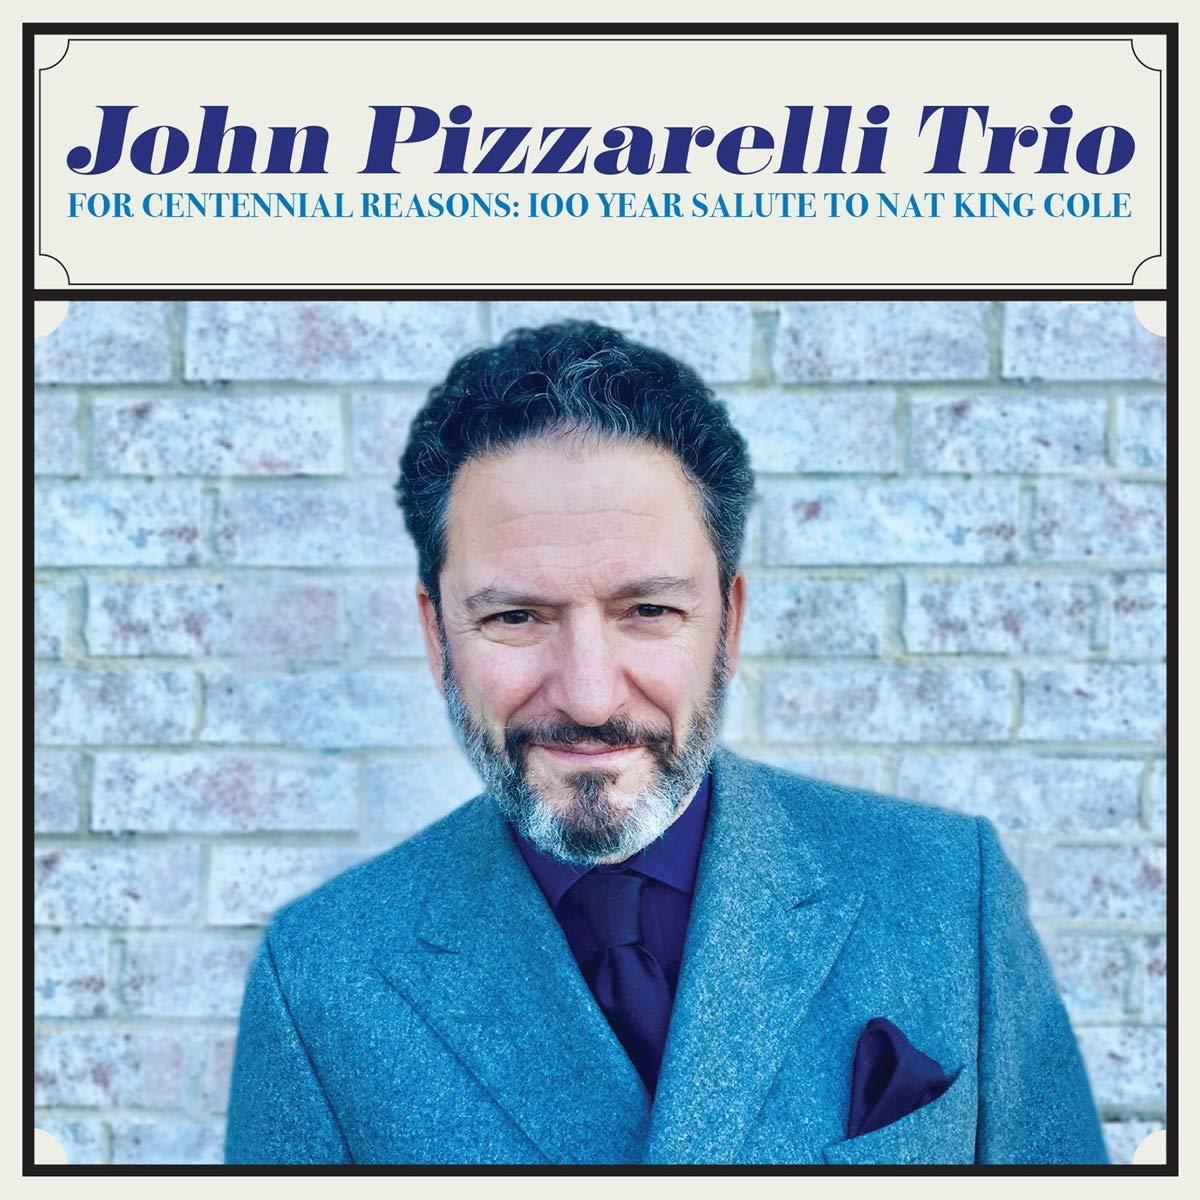 John Pizzarelli talks about his new jazz album For Centennial Reasons